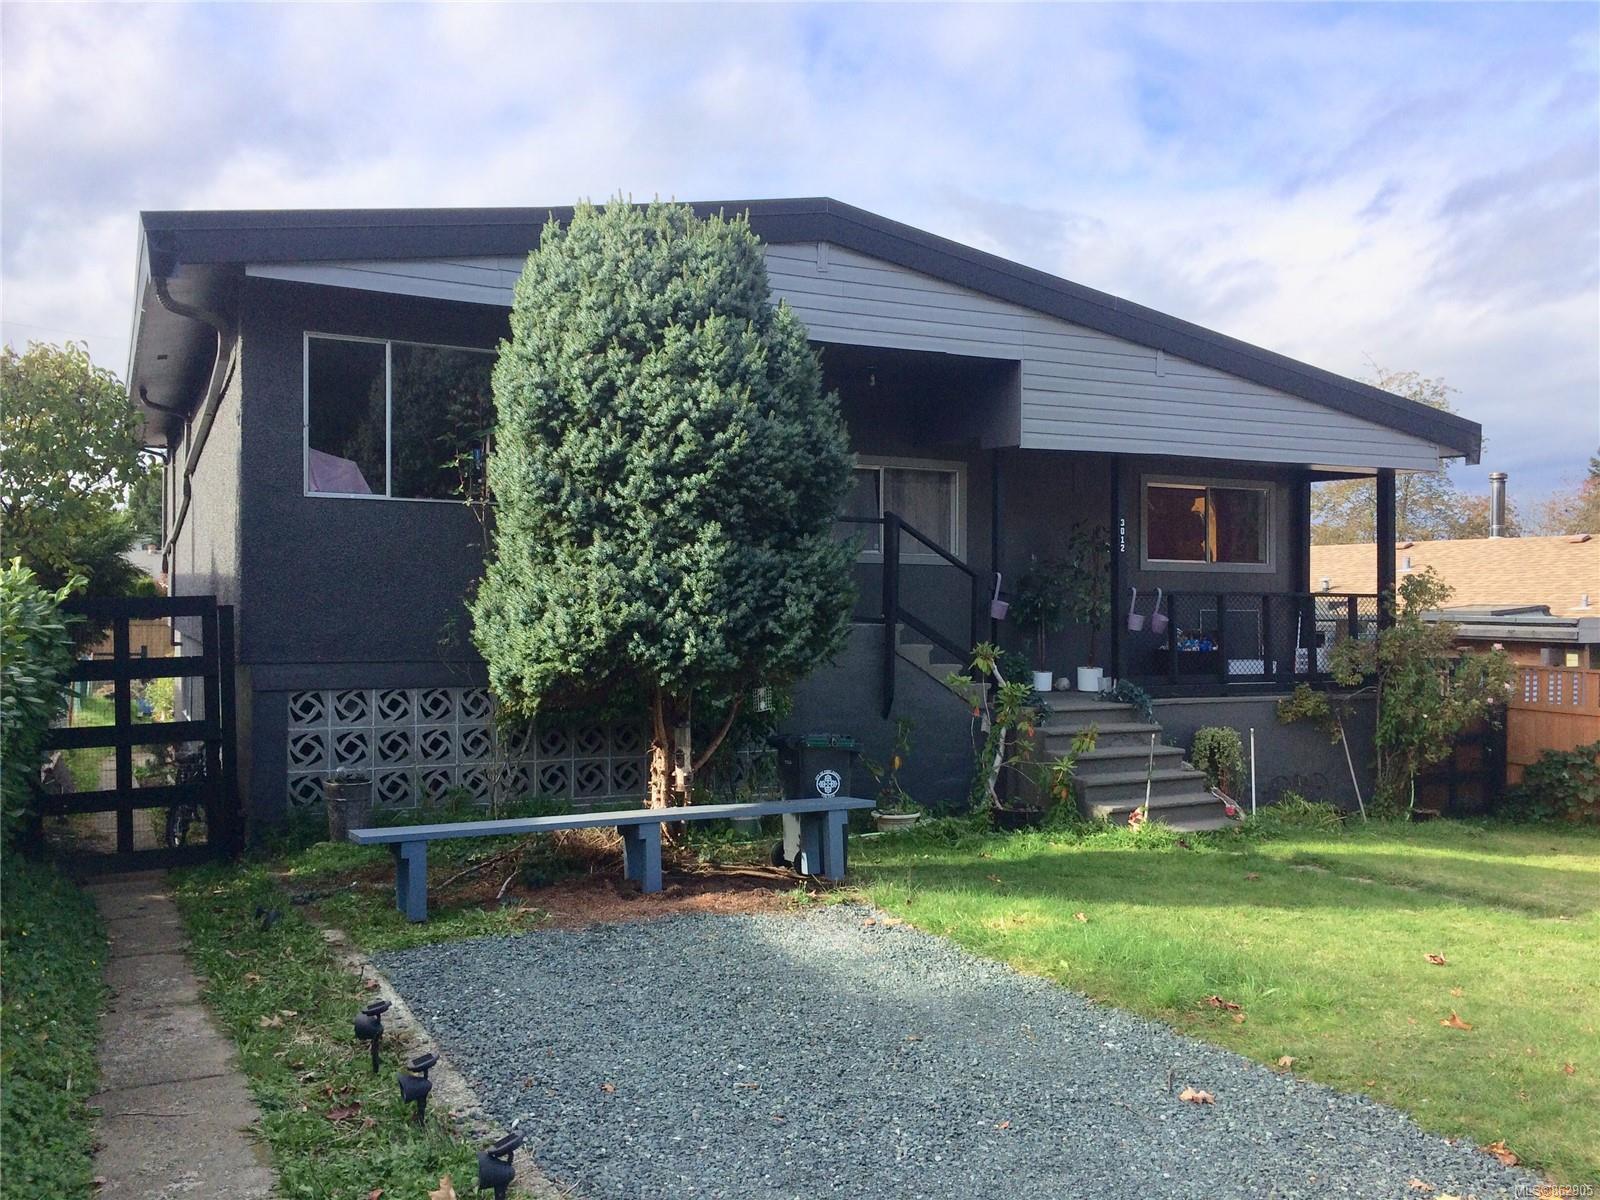 Main Photo: 3012 14th Ave in : PA Port Alberni House for sale (Port Alberni)  : MLS®# 862905